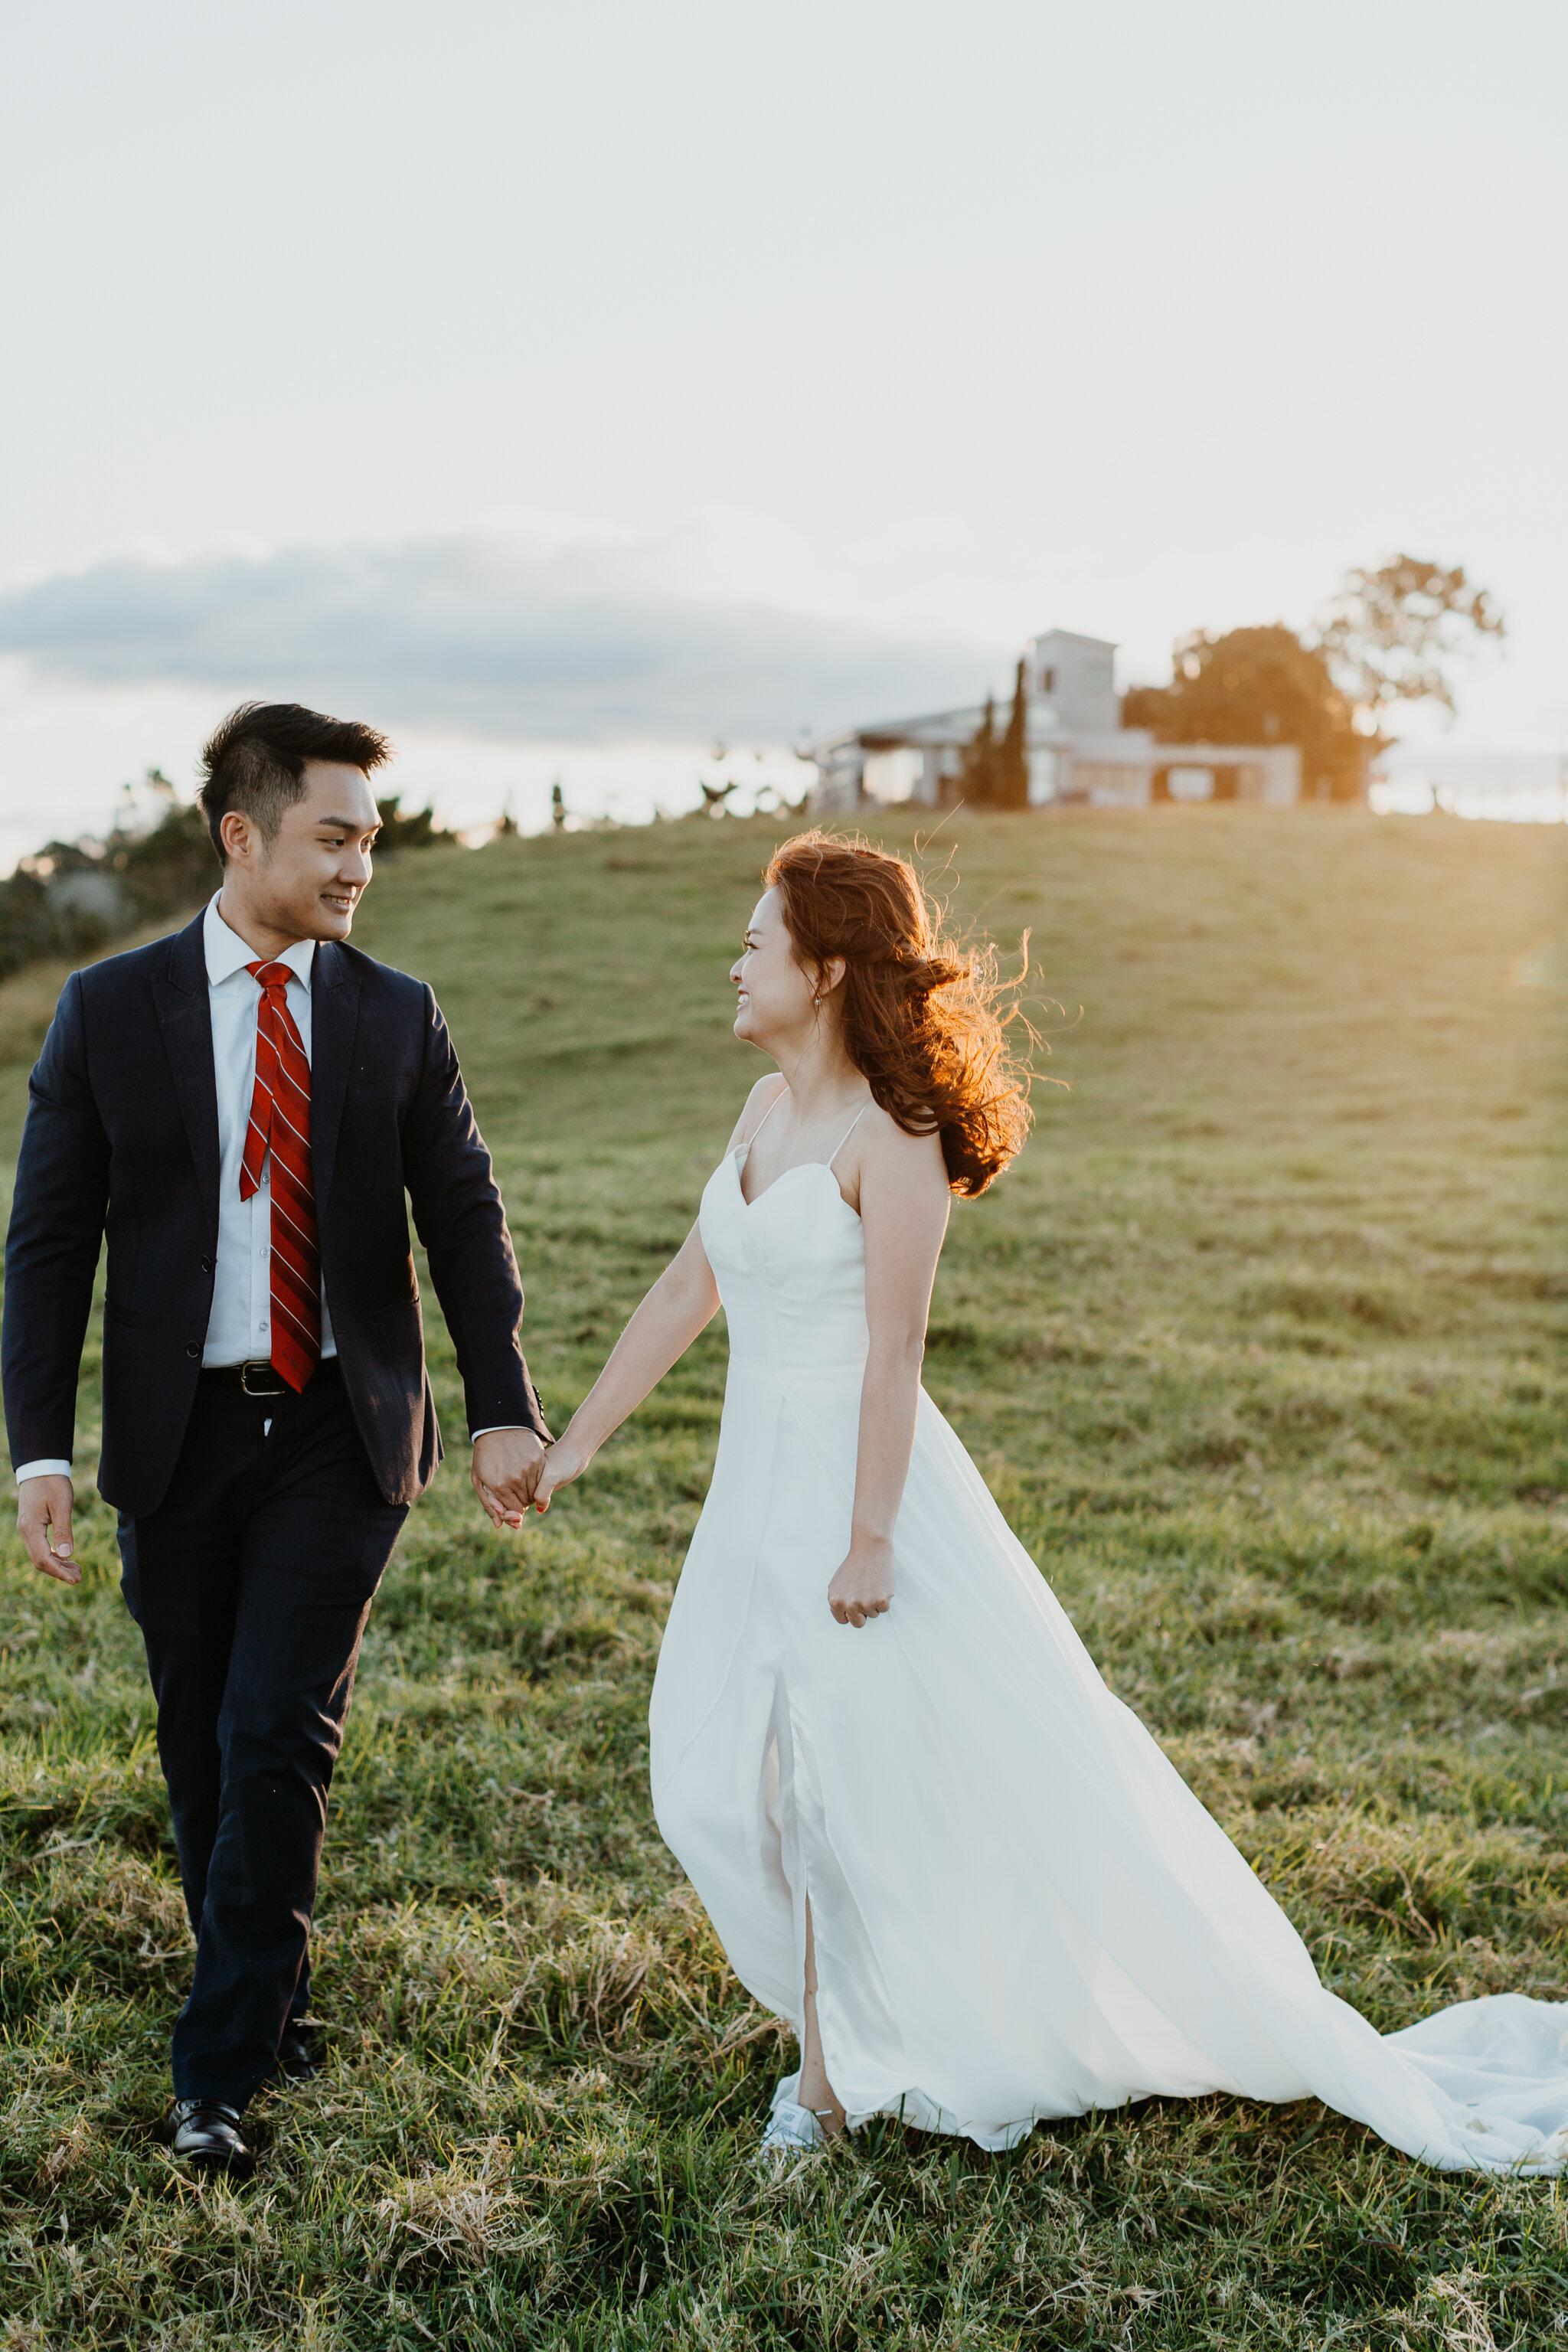 Maleny One Tree Hill Wedding - Maleny Wedding Photographer-30.jpg